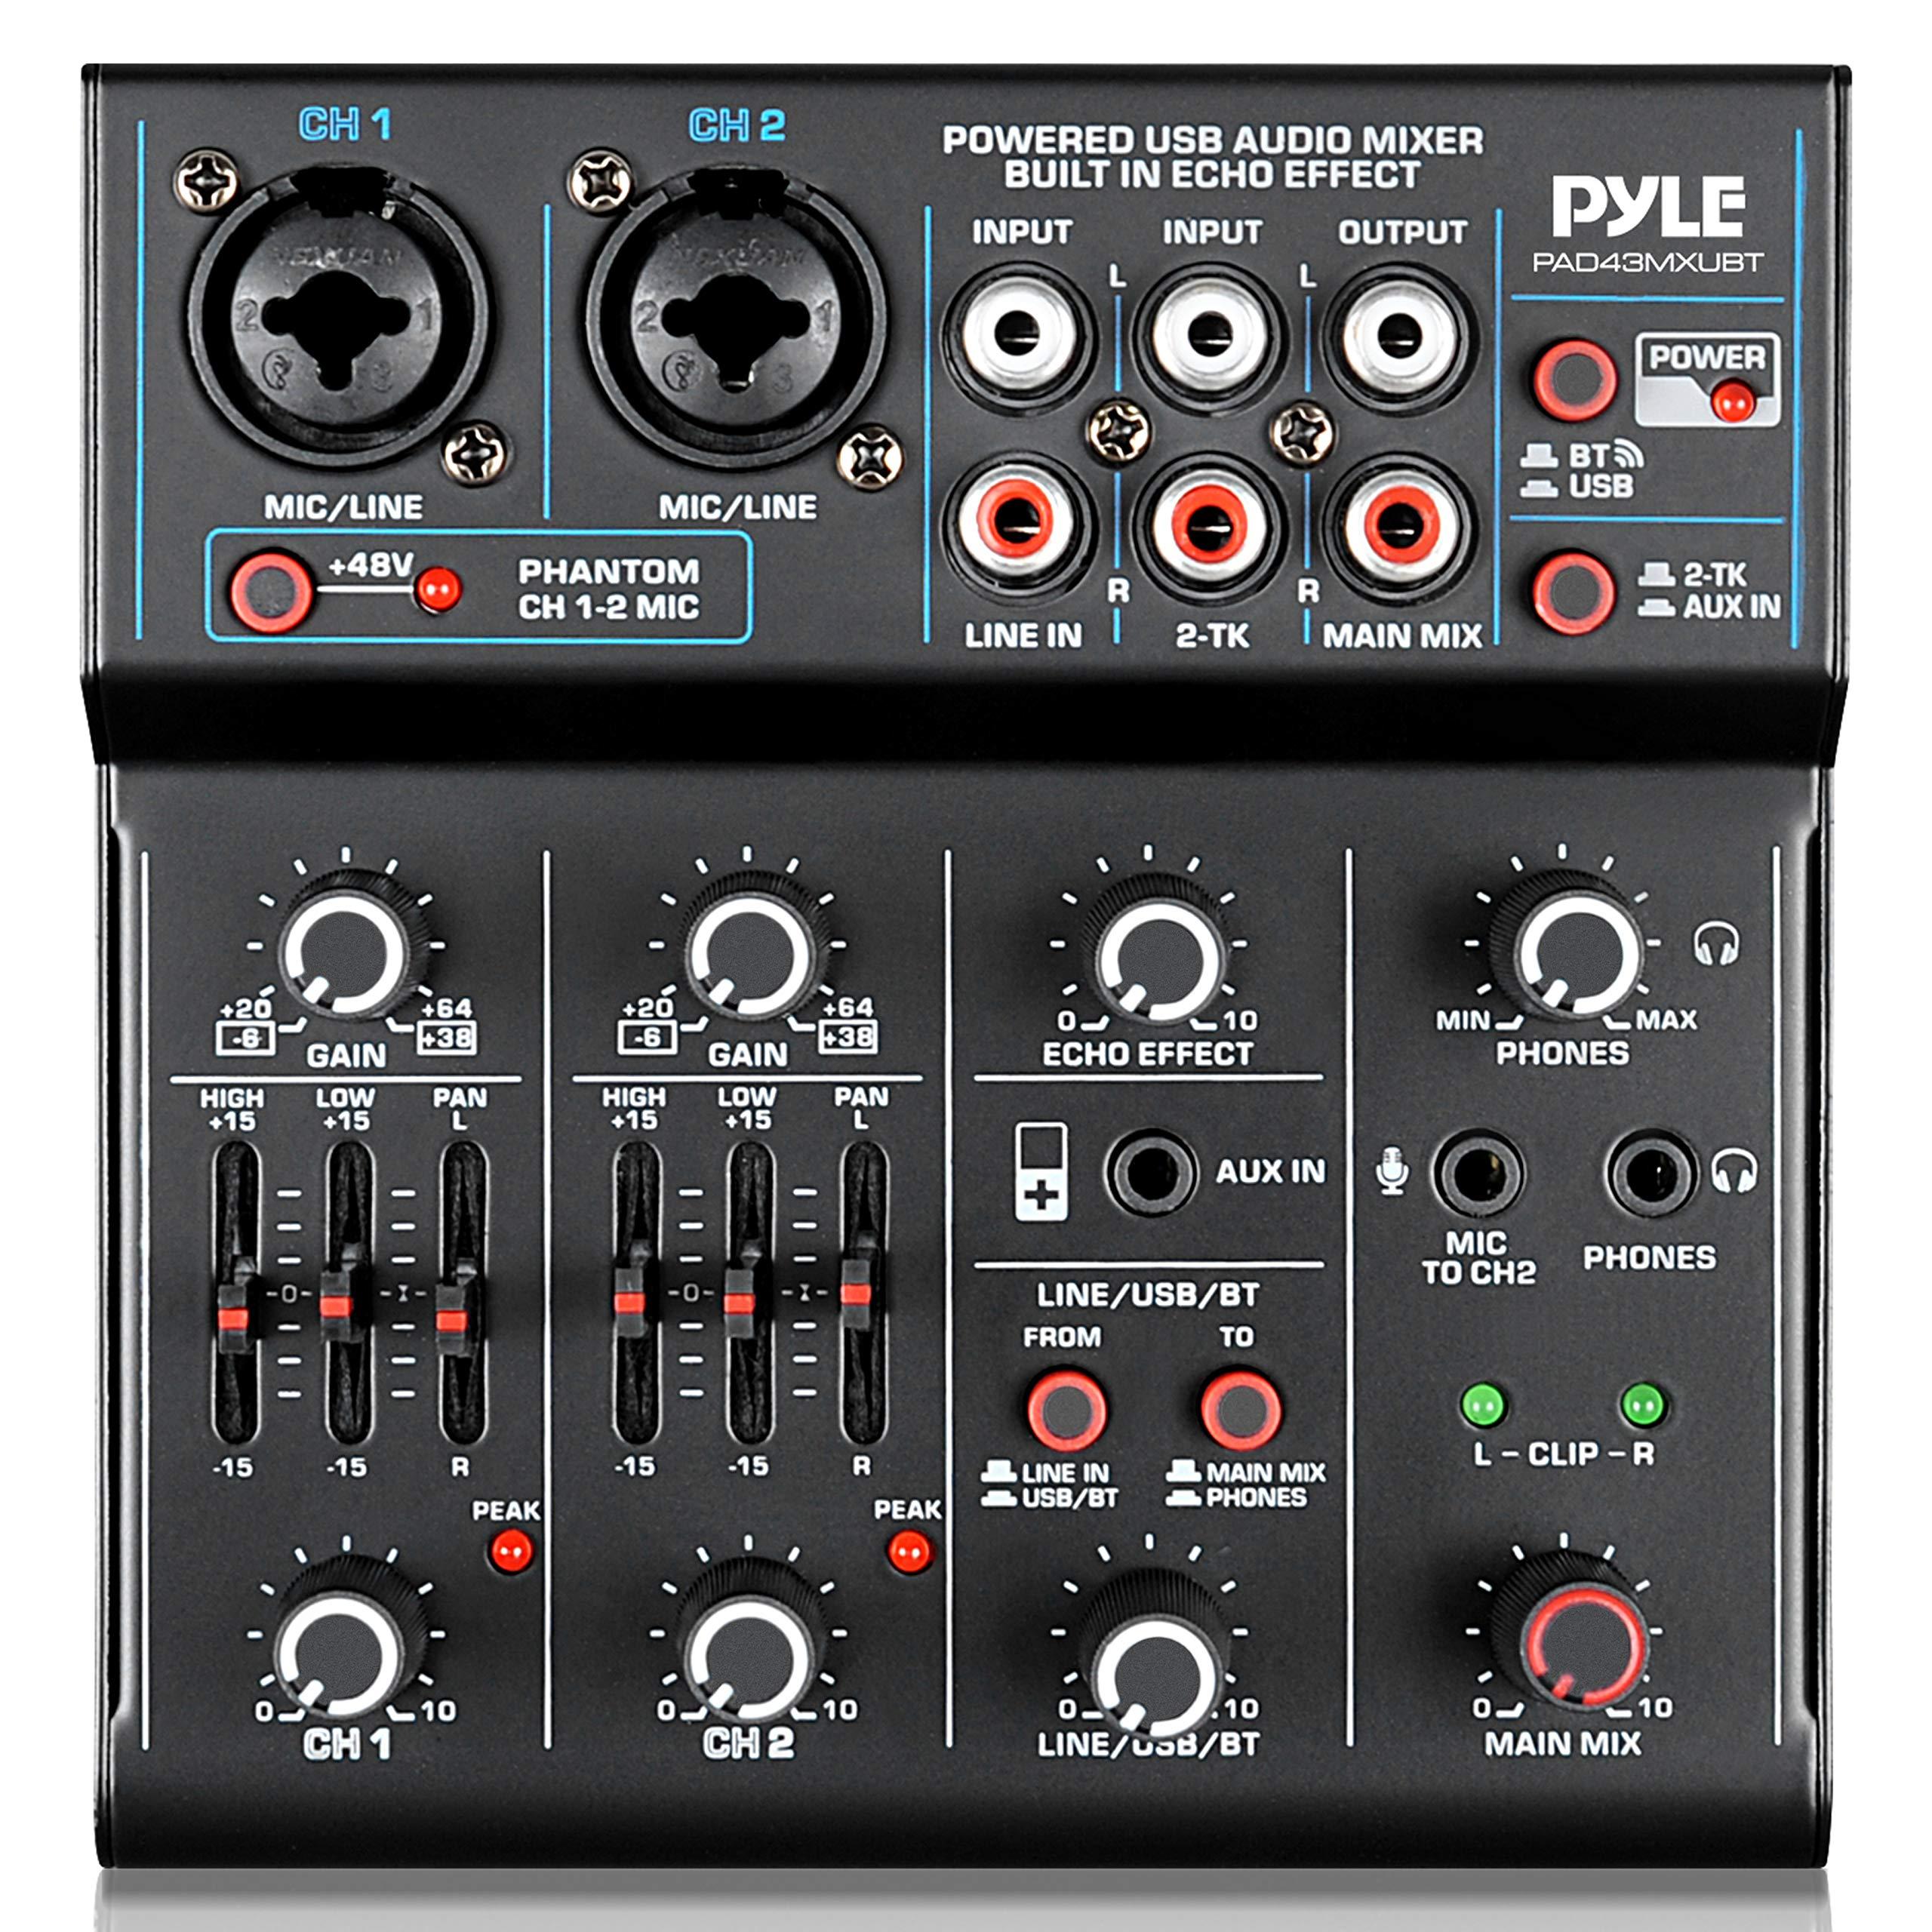 Professional Wireless DJ Audio Mixer - 4-Channel Bluetooth DJ Controller Sound Mixer - USB Audio Interface, 2 Combo Jack XLR+6.35mm Mic/Line/Guitar In, 3.5mm, RCA AUX, Headphone Jack - Pyle PAD43MXUBT